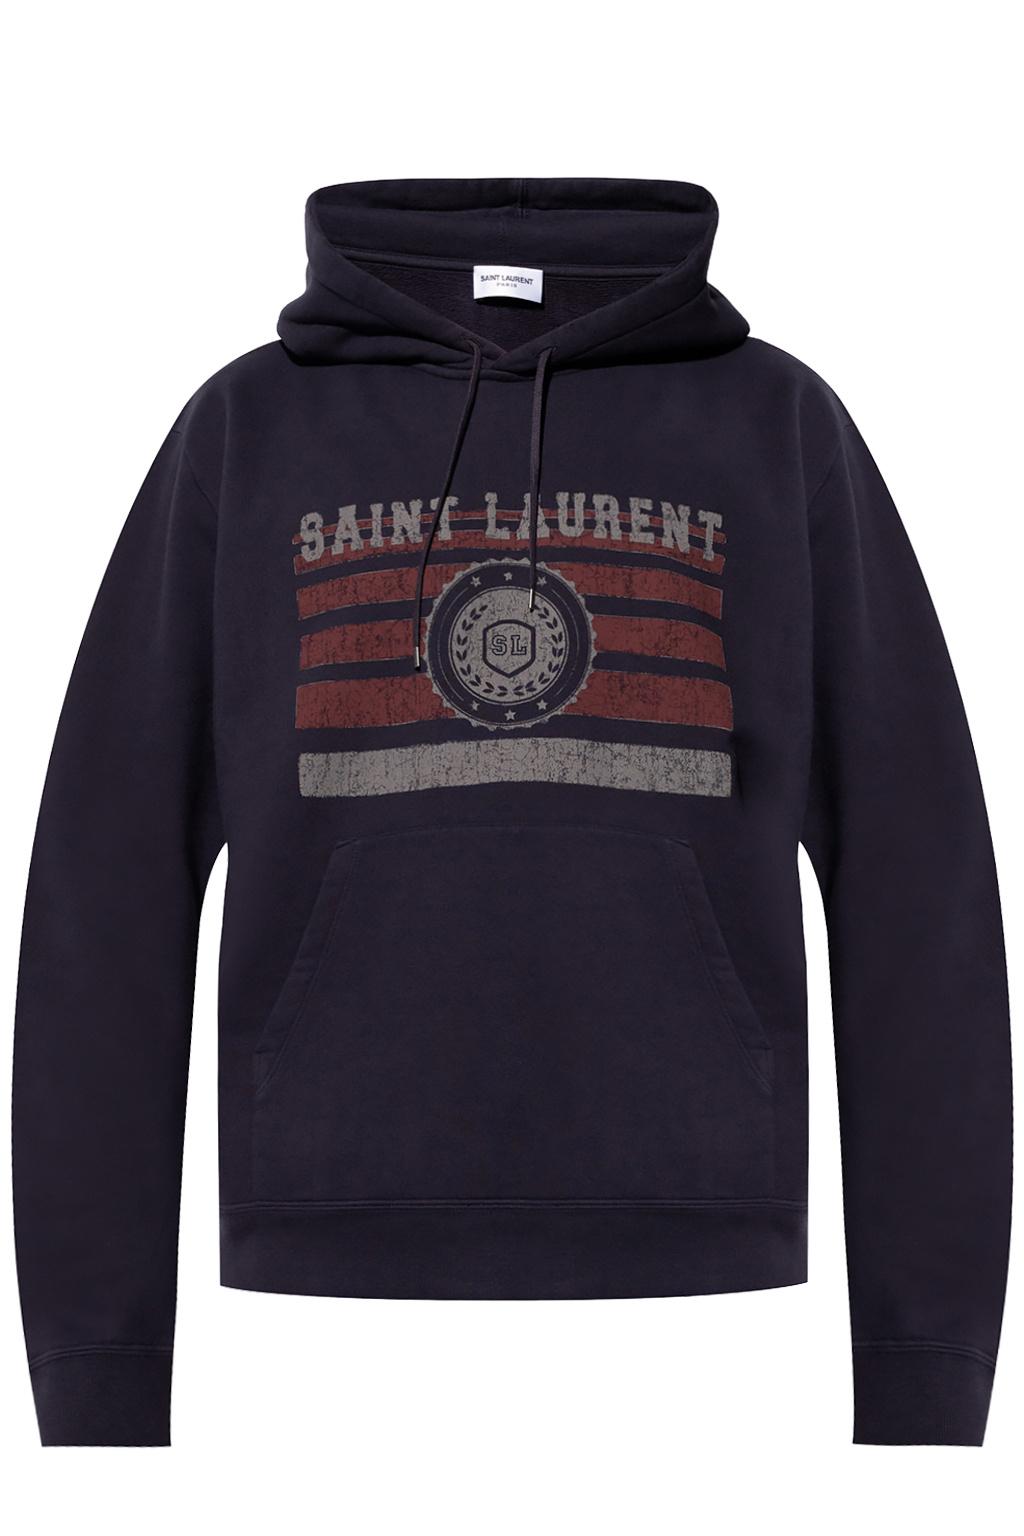 Saint Laurent Hoodie with logo